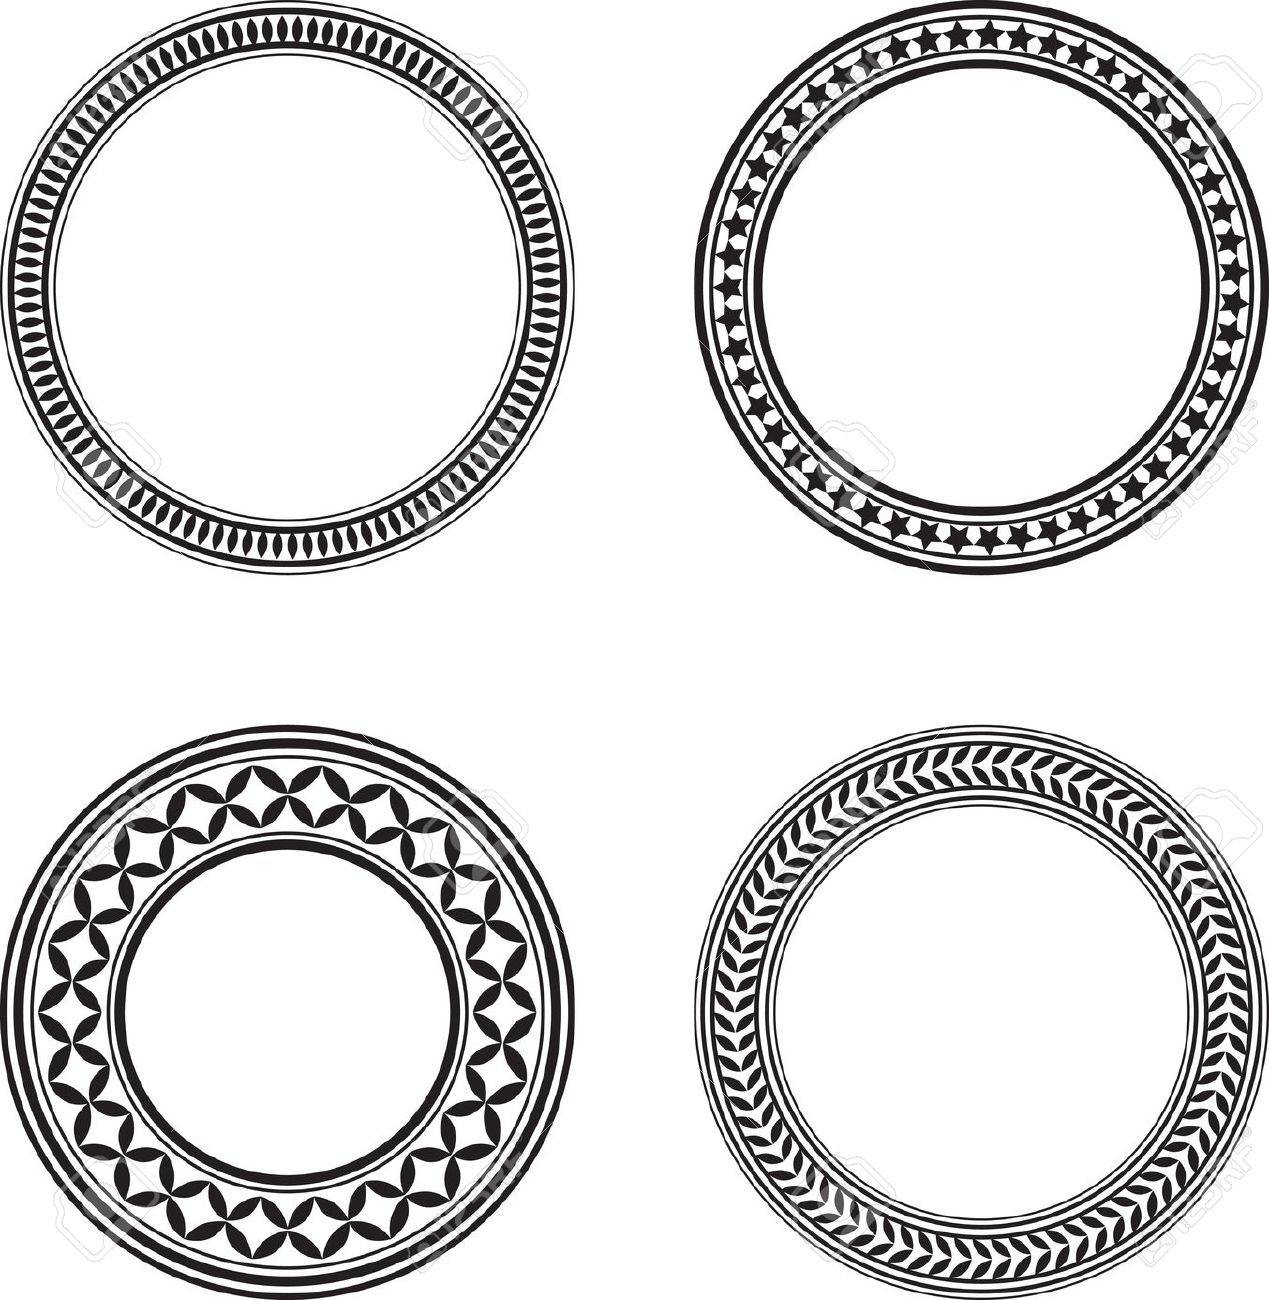 Design elements - 14959821